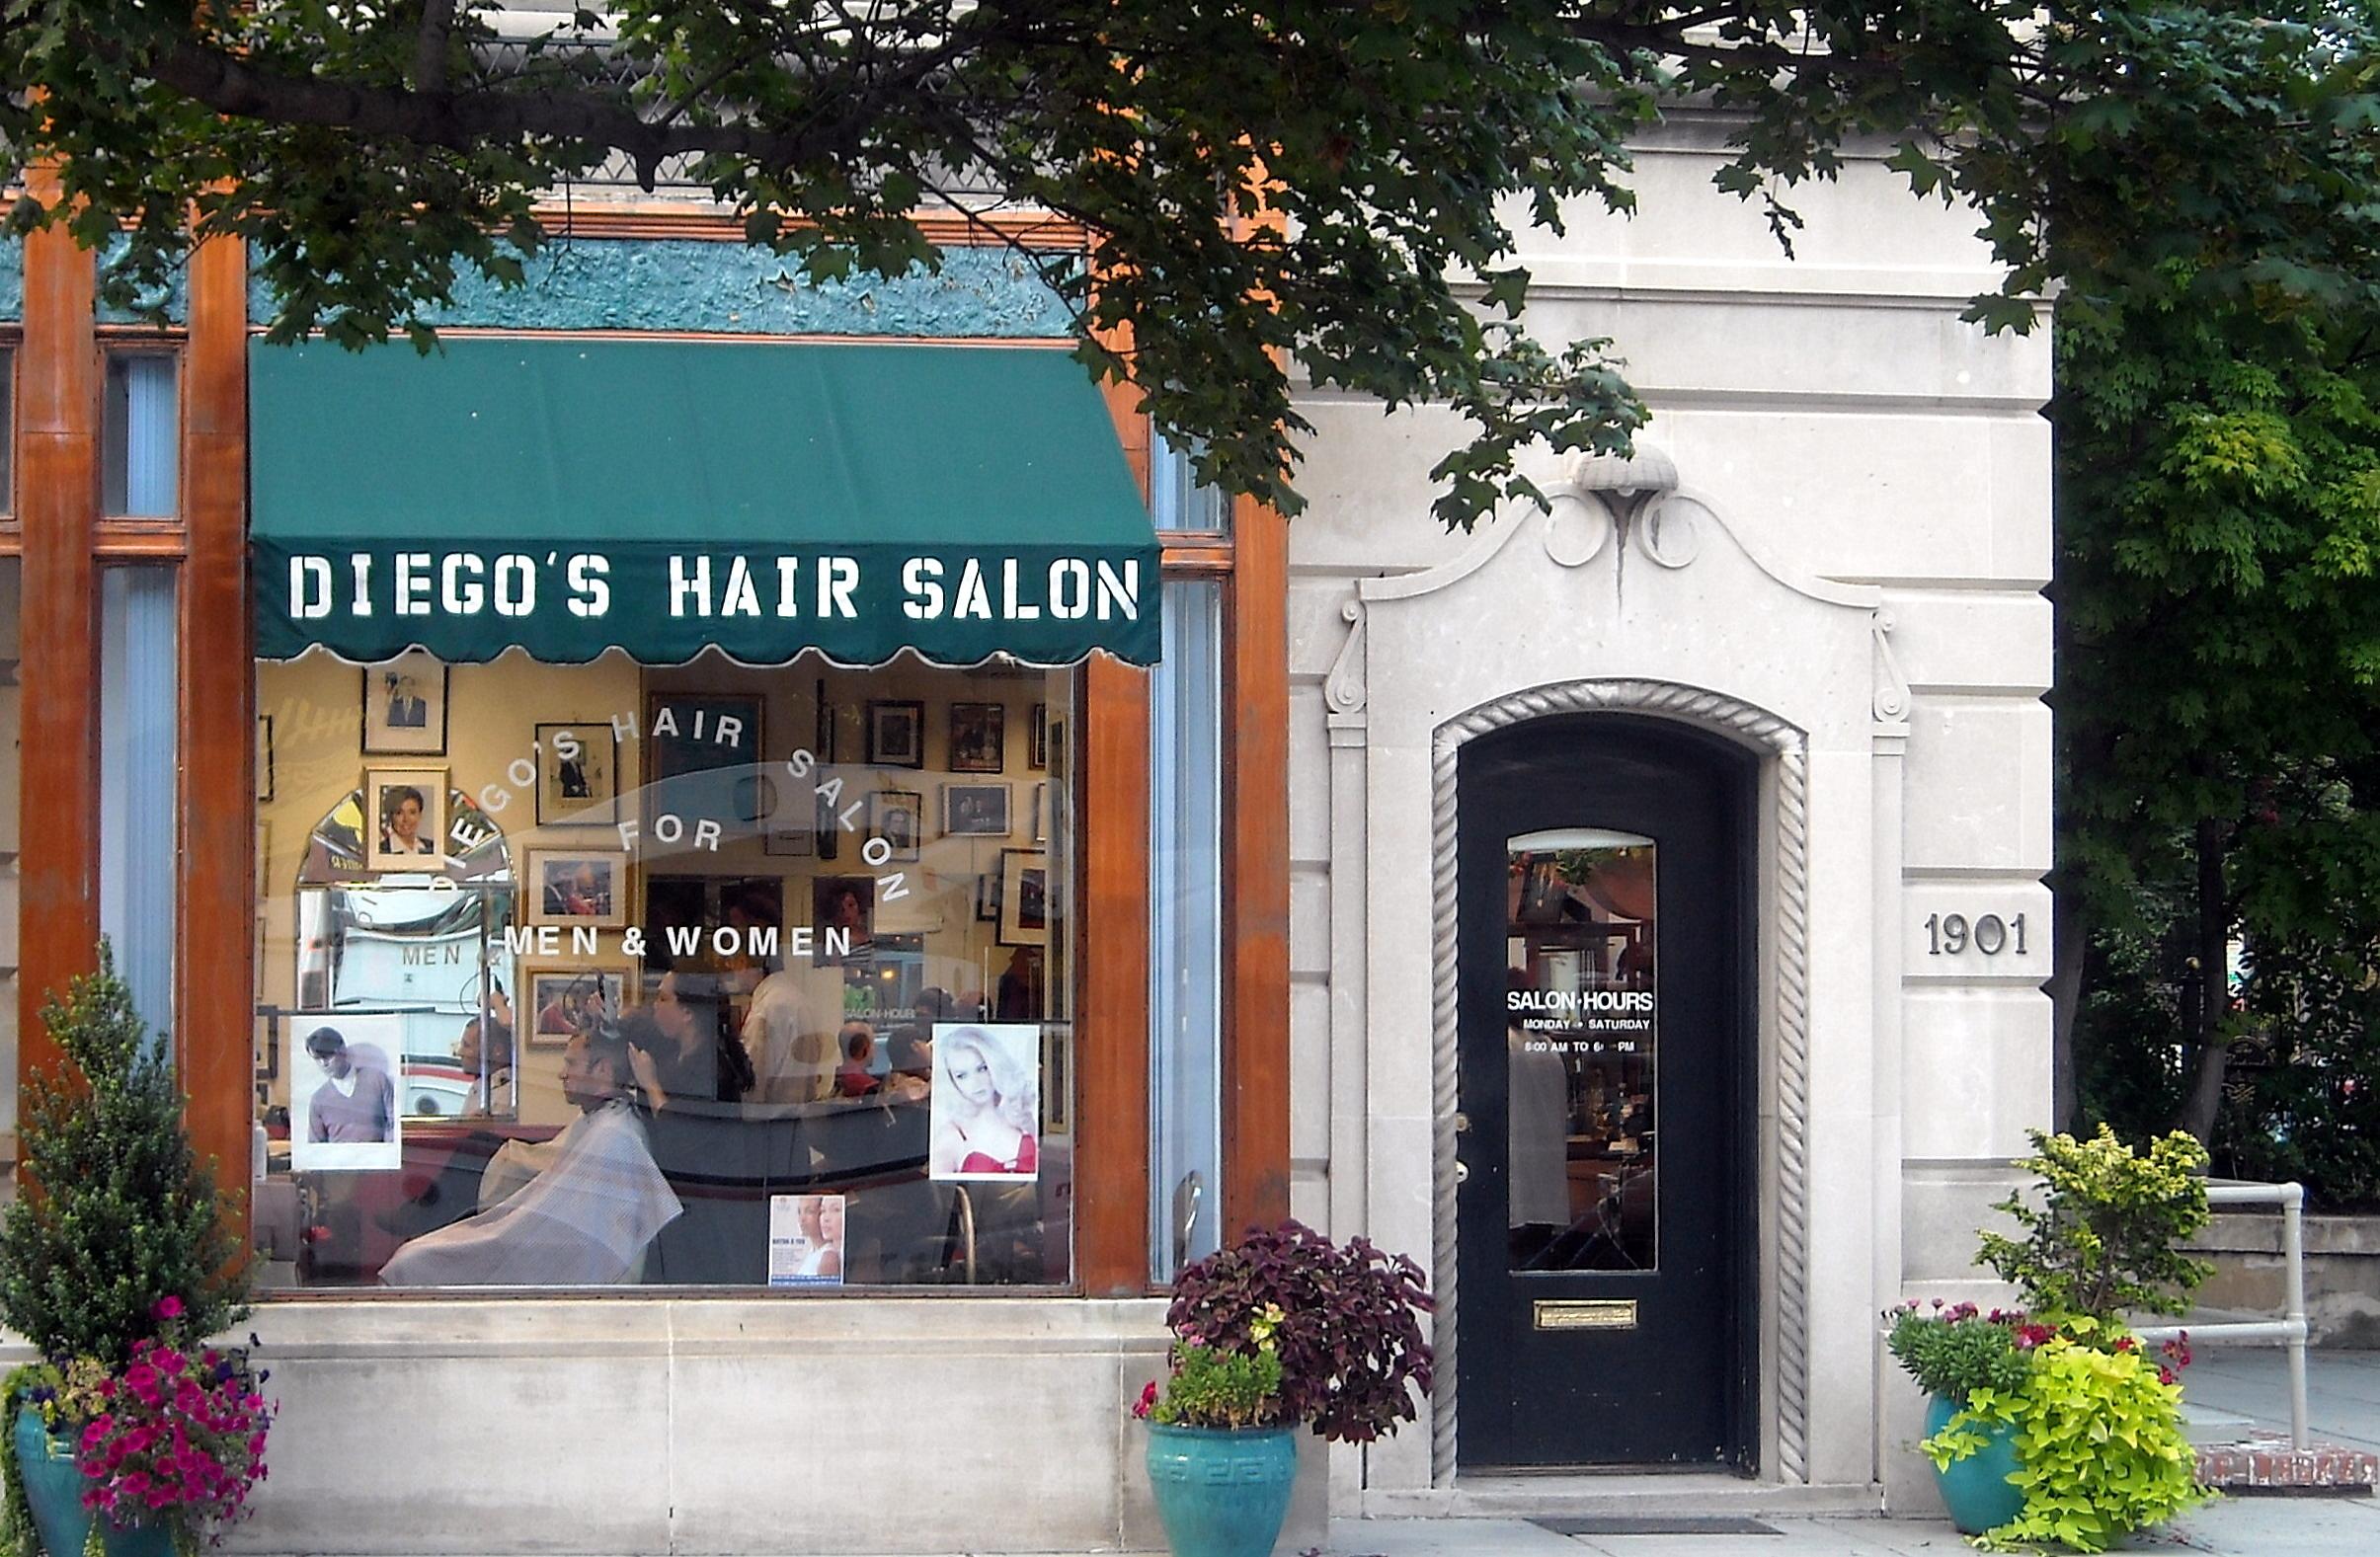 Hair Parlor : File:Diegos Hair Salon.jpg - Wikimedia Commons